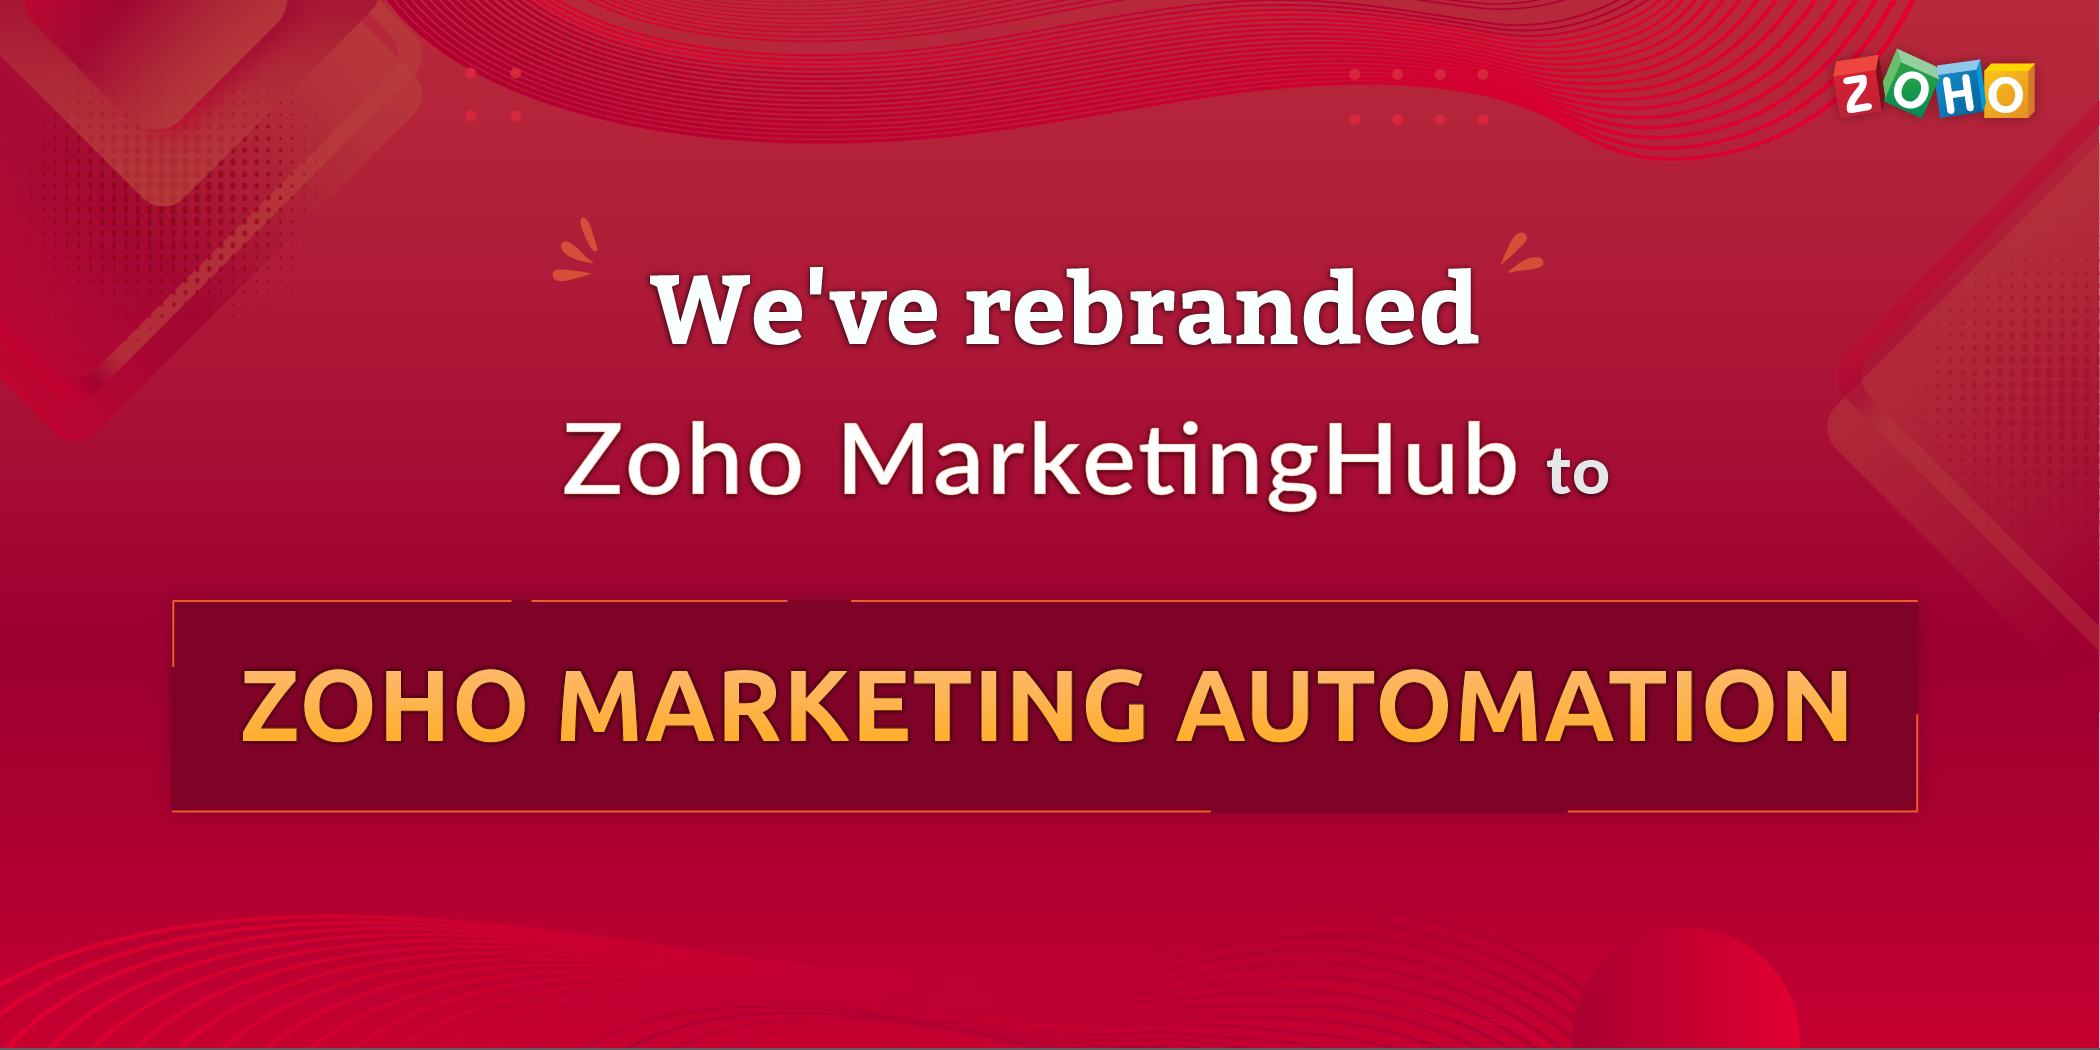 Zoho MarketingHub ahora es Zoho Marketing Automation